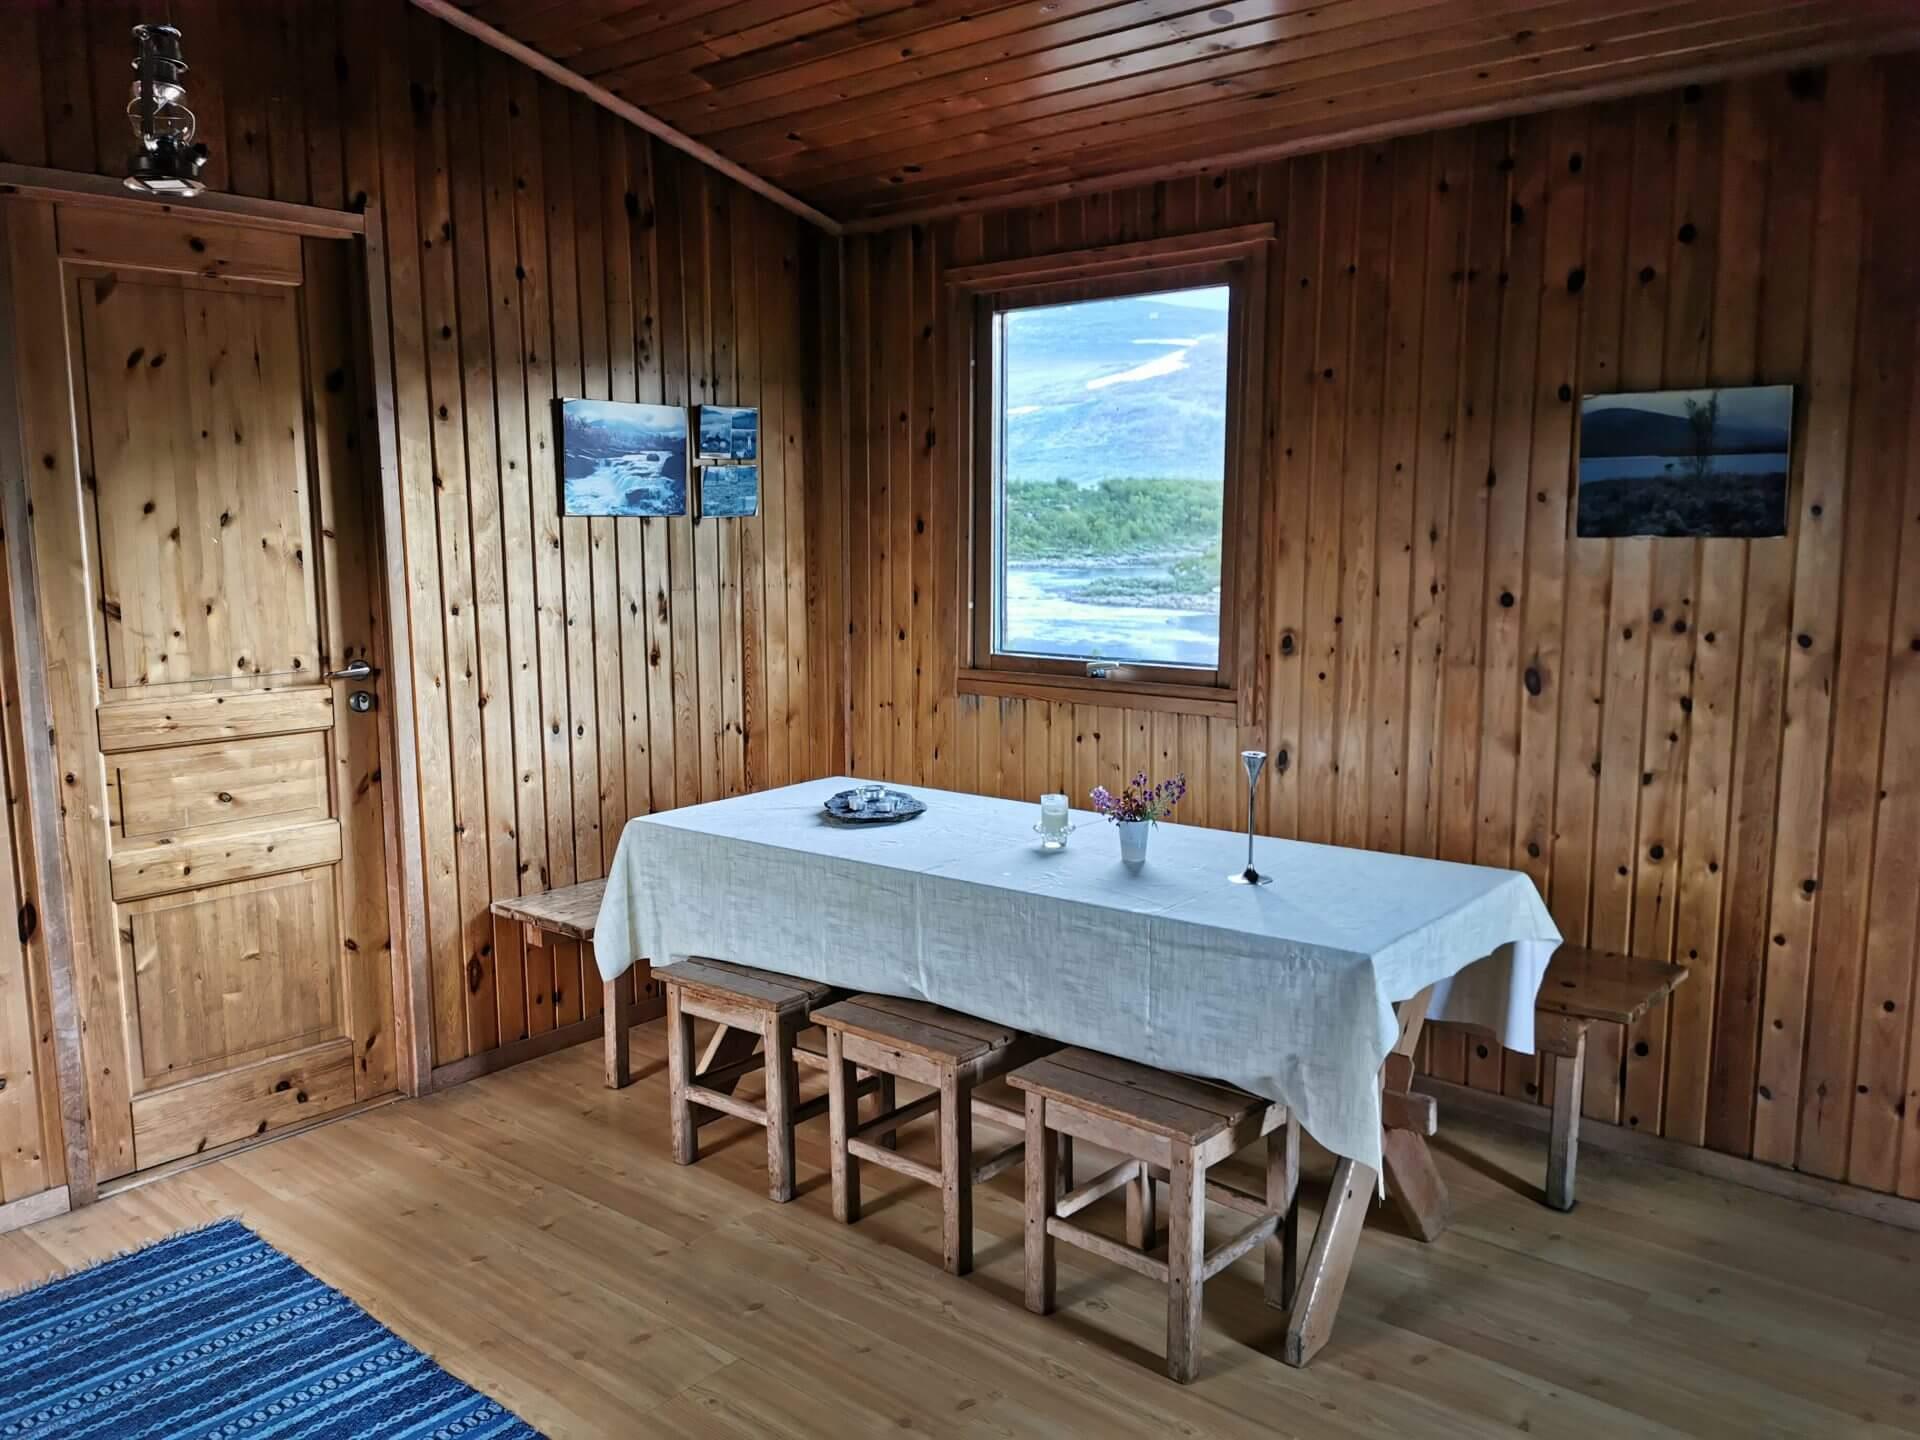 Arctic Circle Race 2019 Guijaure Polcirkeln stuga in